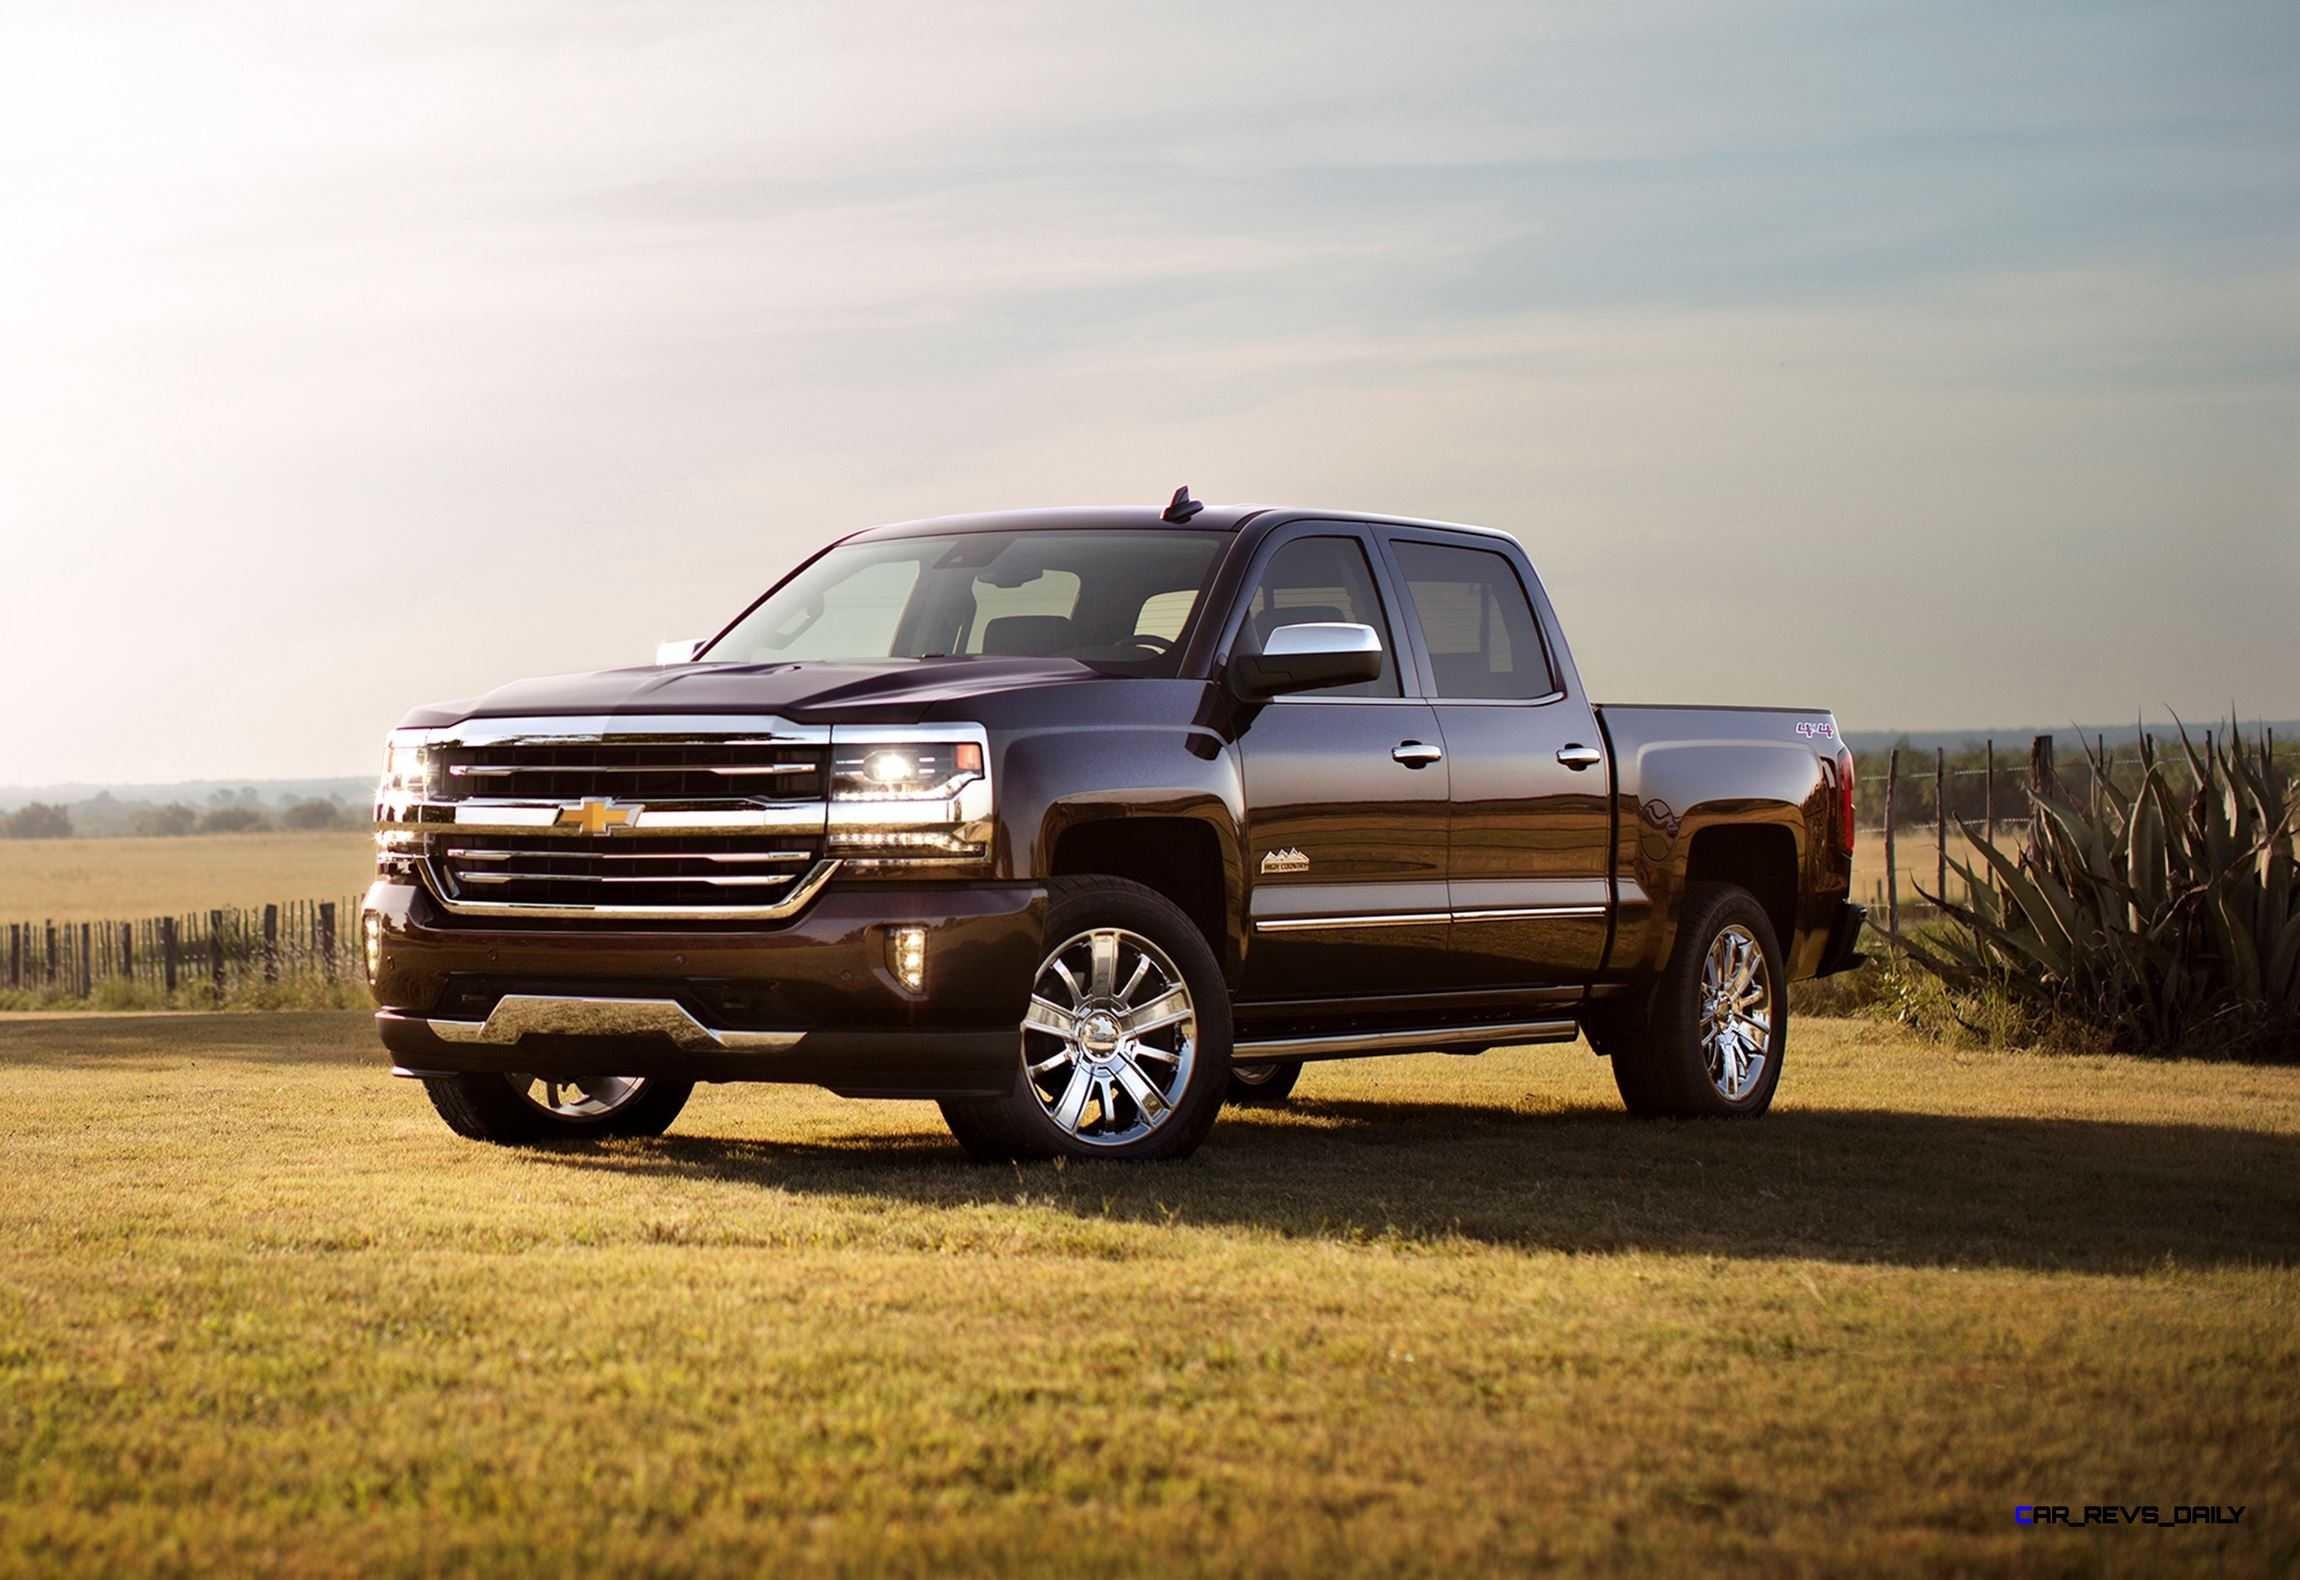 2016 Chevrolet Silverado High Country Wallpaper Background #13280 .